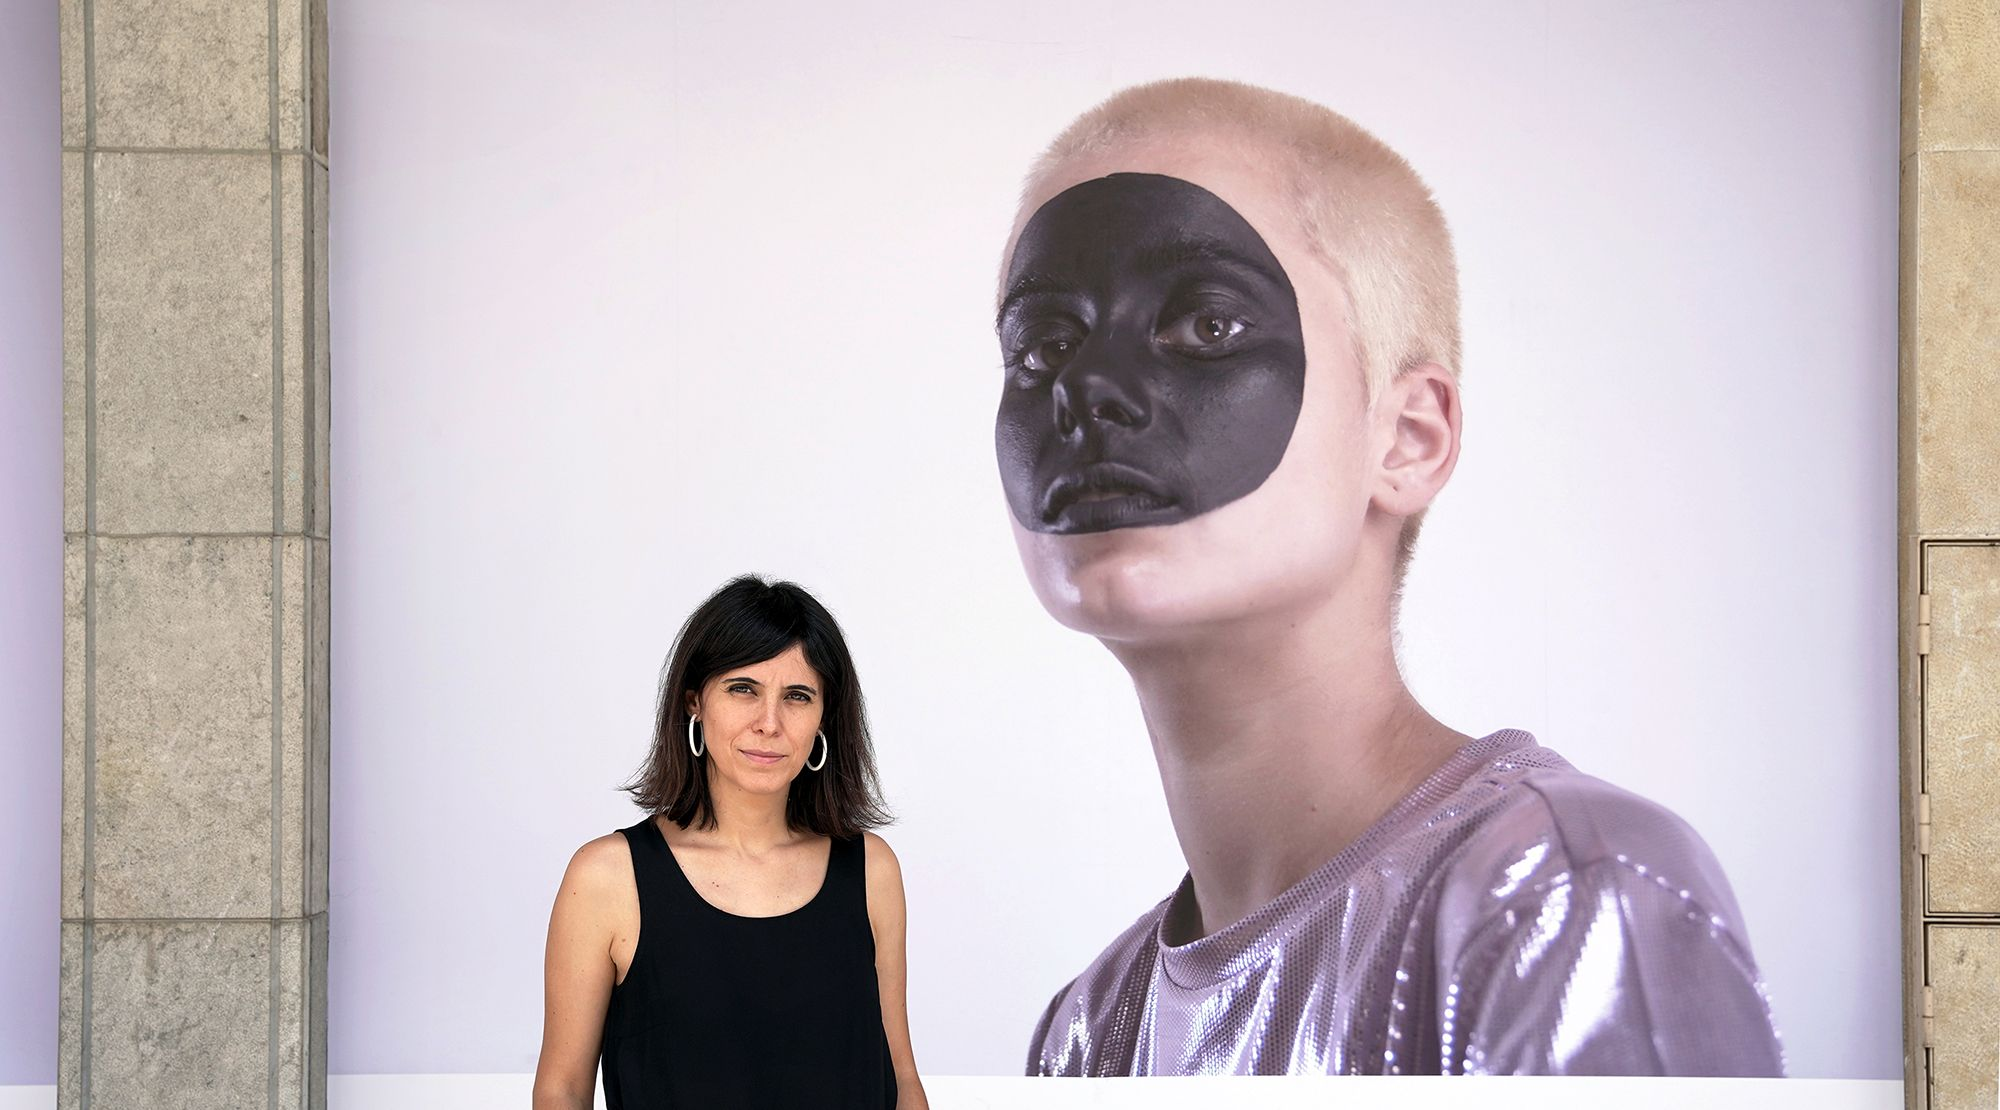 Exposición 'Liminal' de la diseñadora alcorina Marta Negre